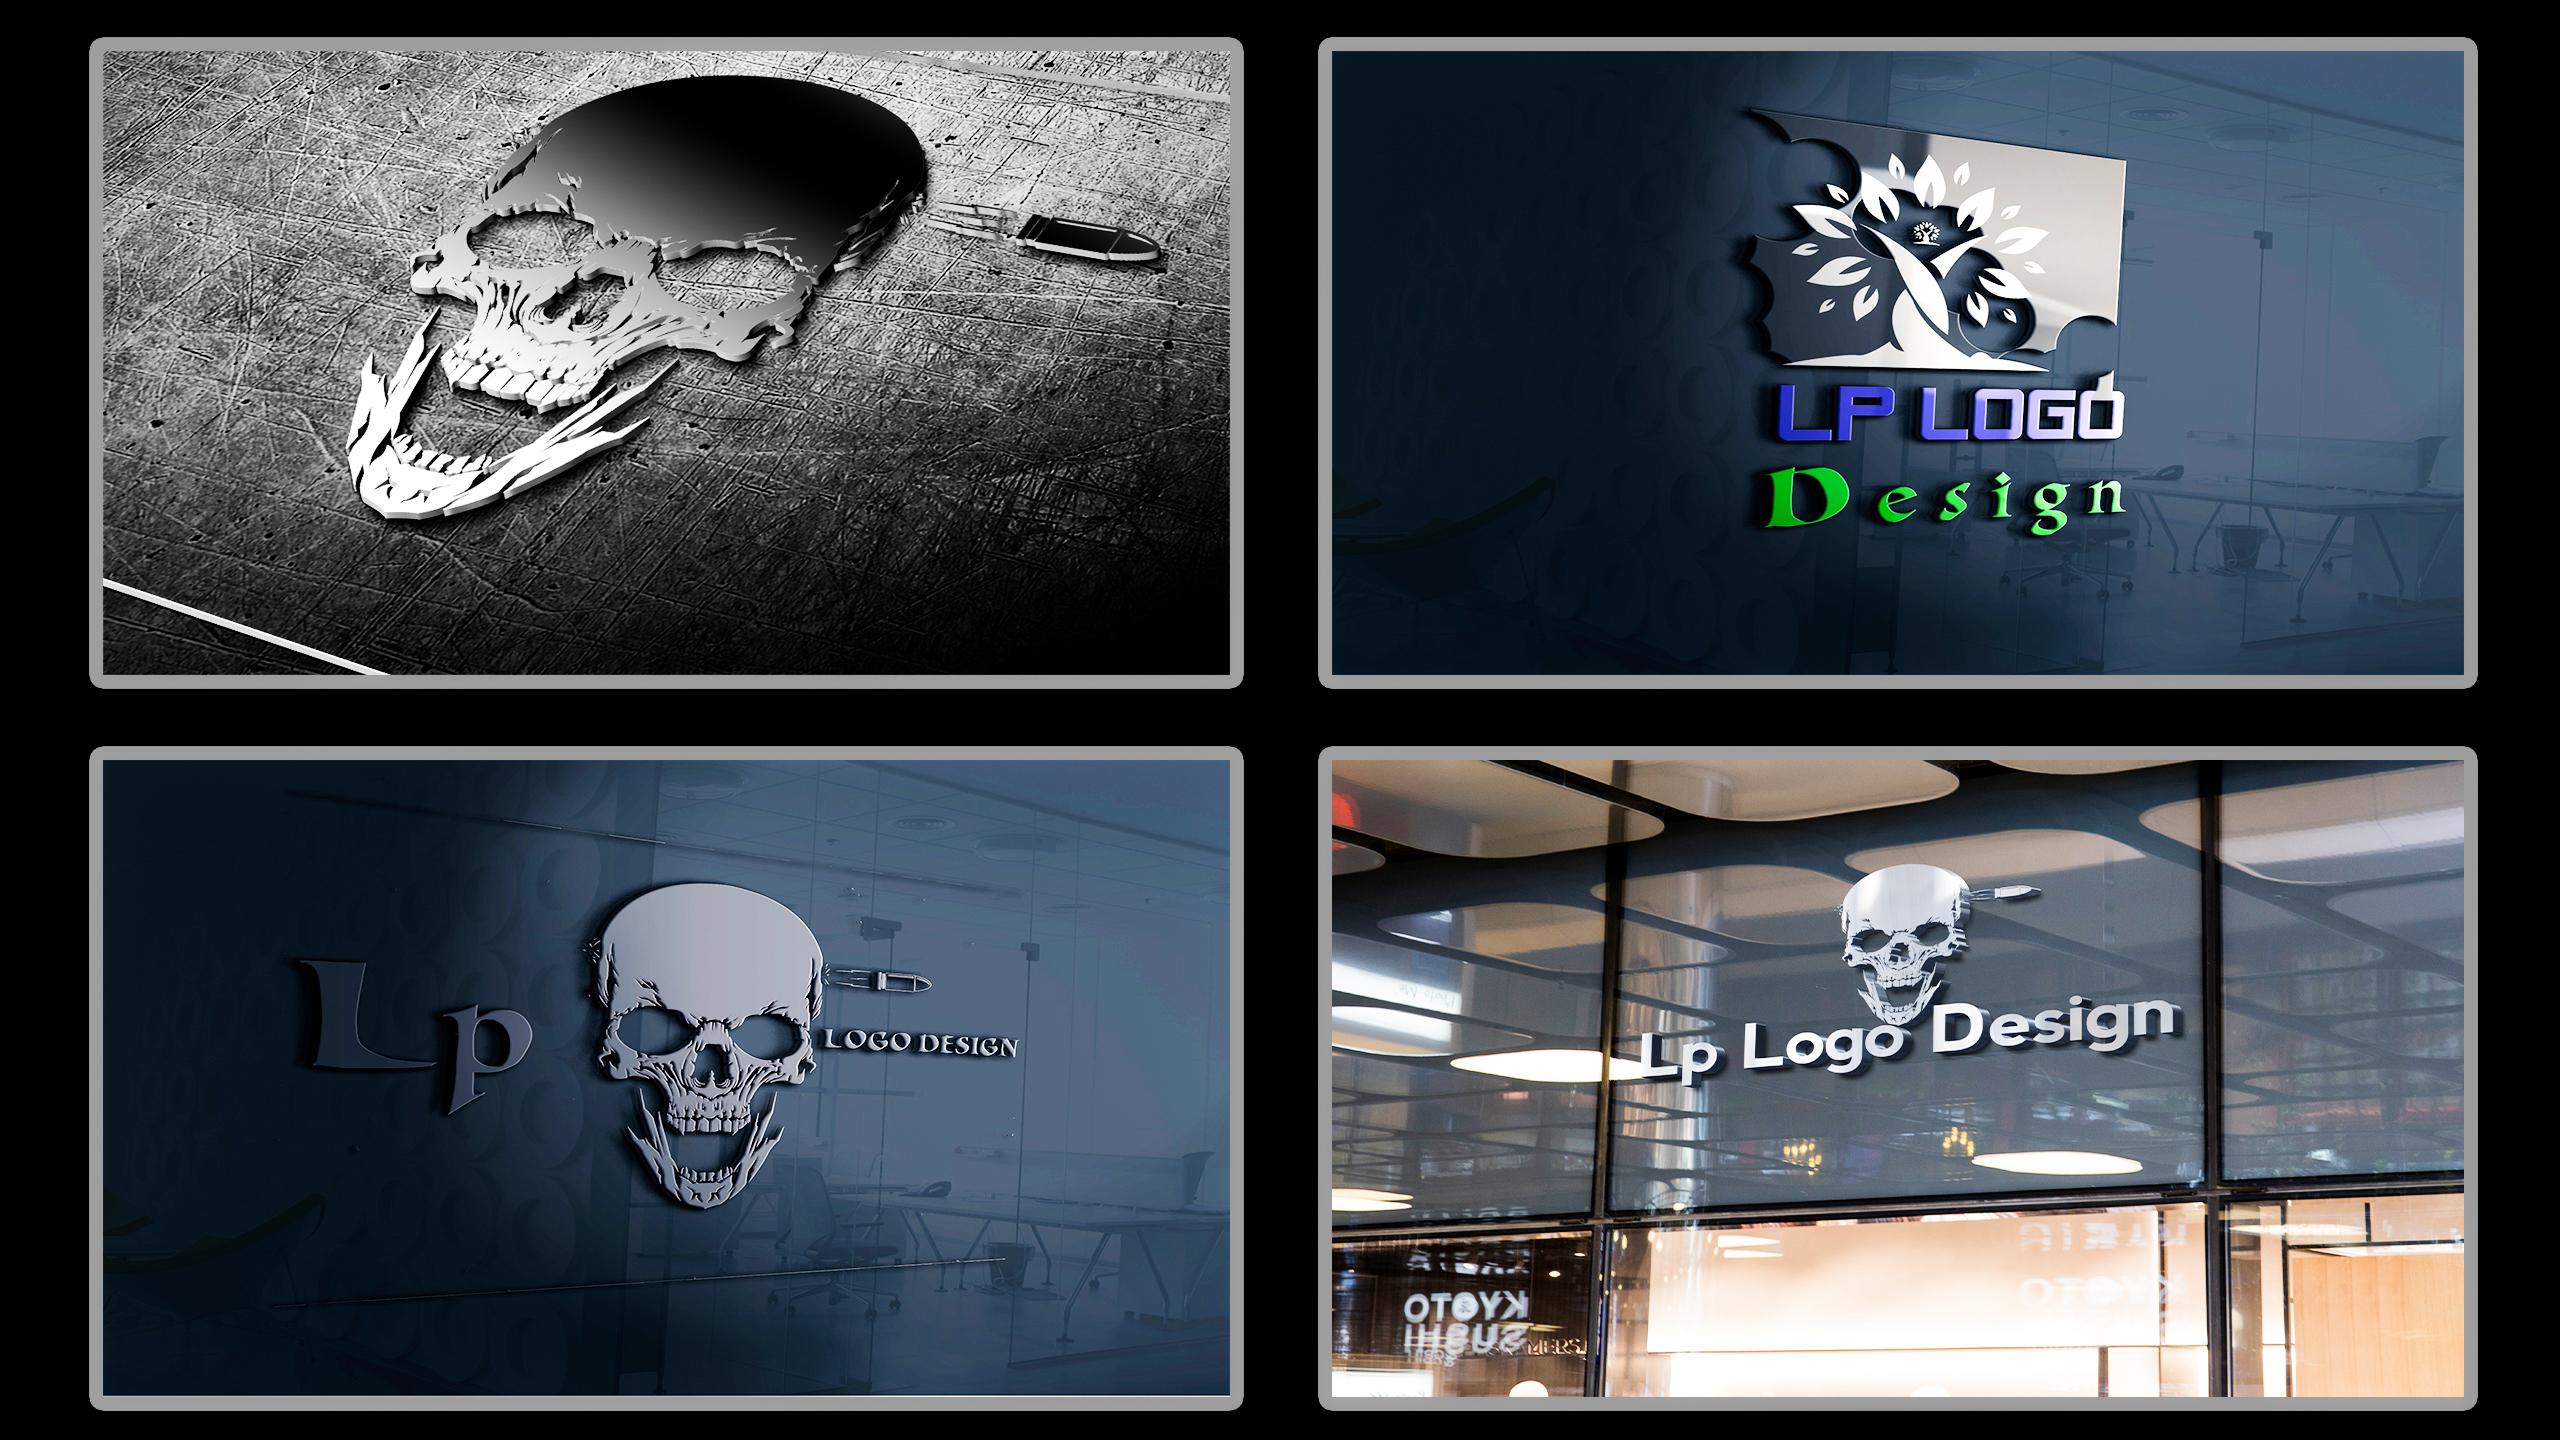 I Will Design Professional & Unique Logo Designer Business, YouTube and websites Logo Design